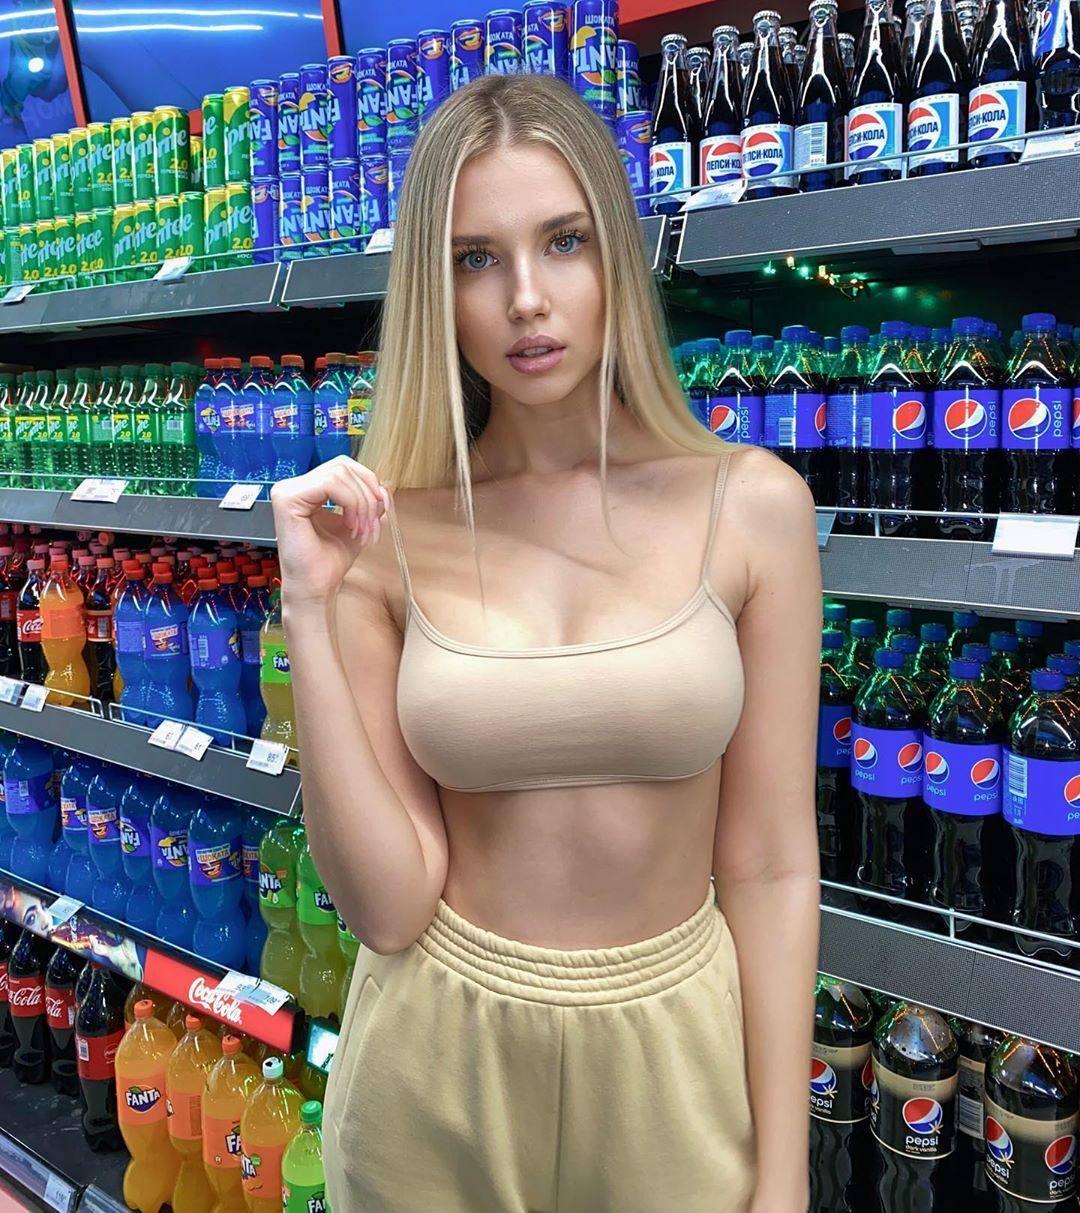 Polina Malinovskaya – Beautiful Big Boobs In Sexy Instagram Pics 0010